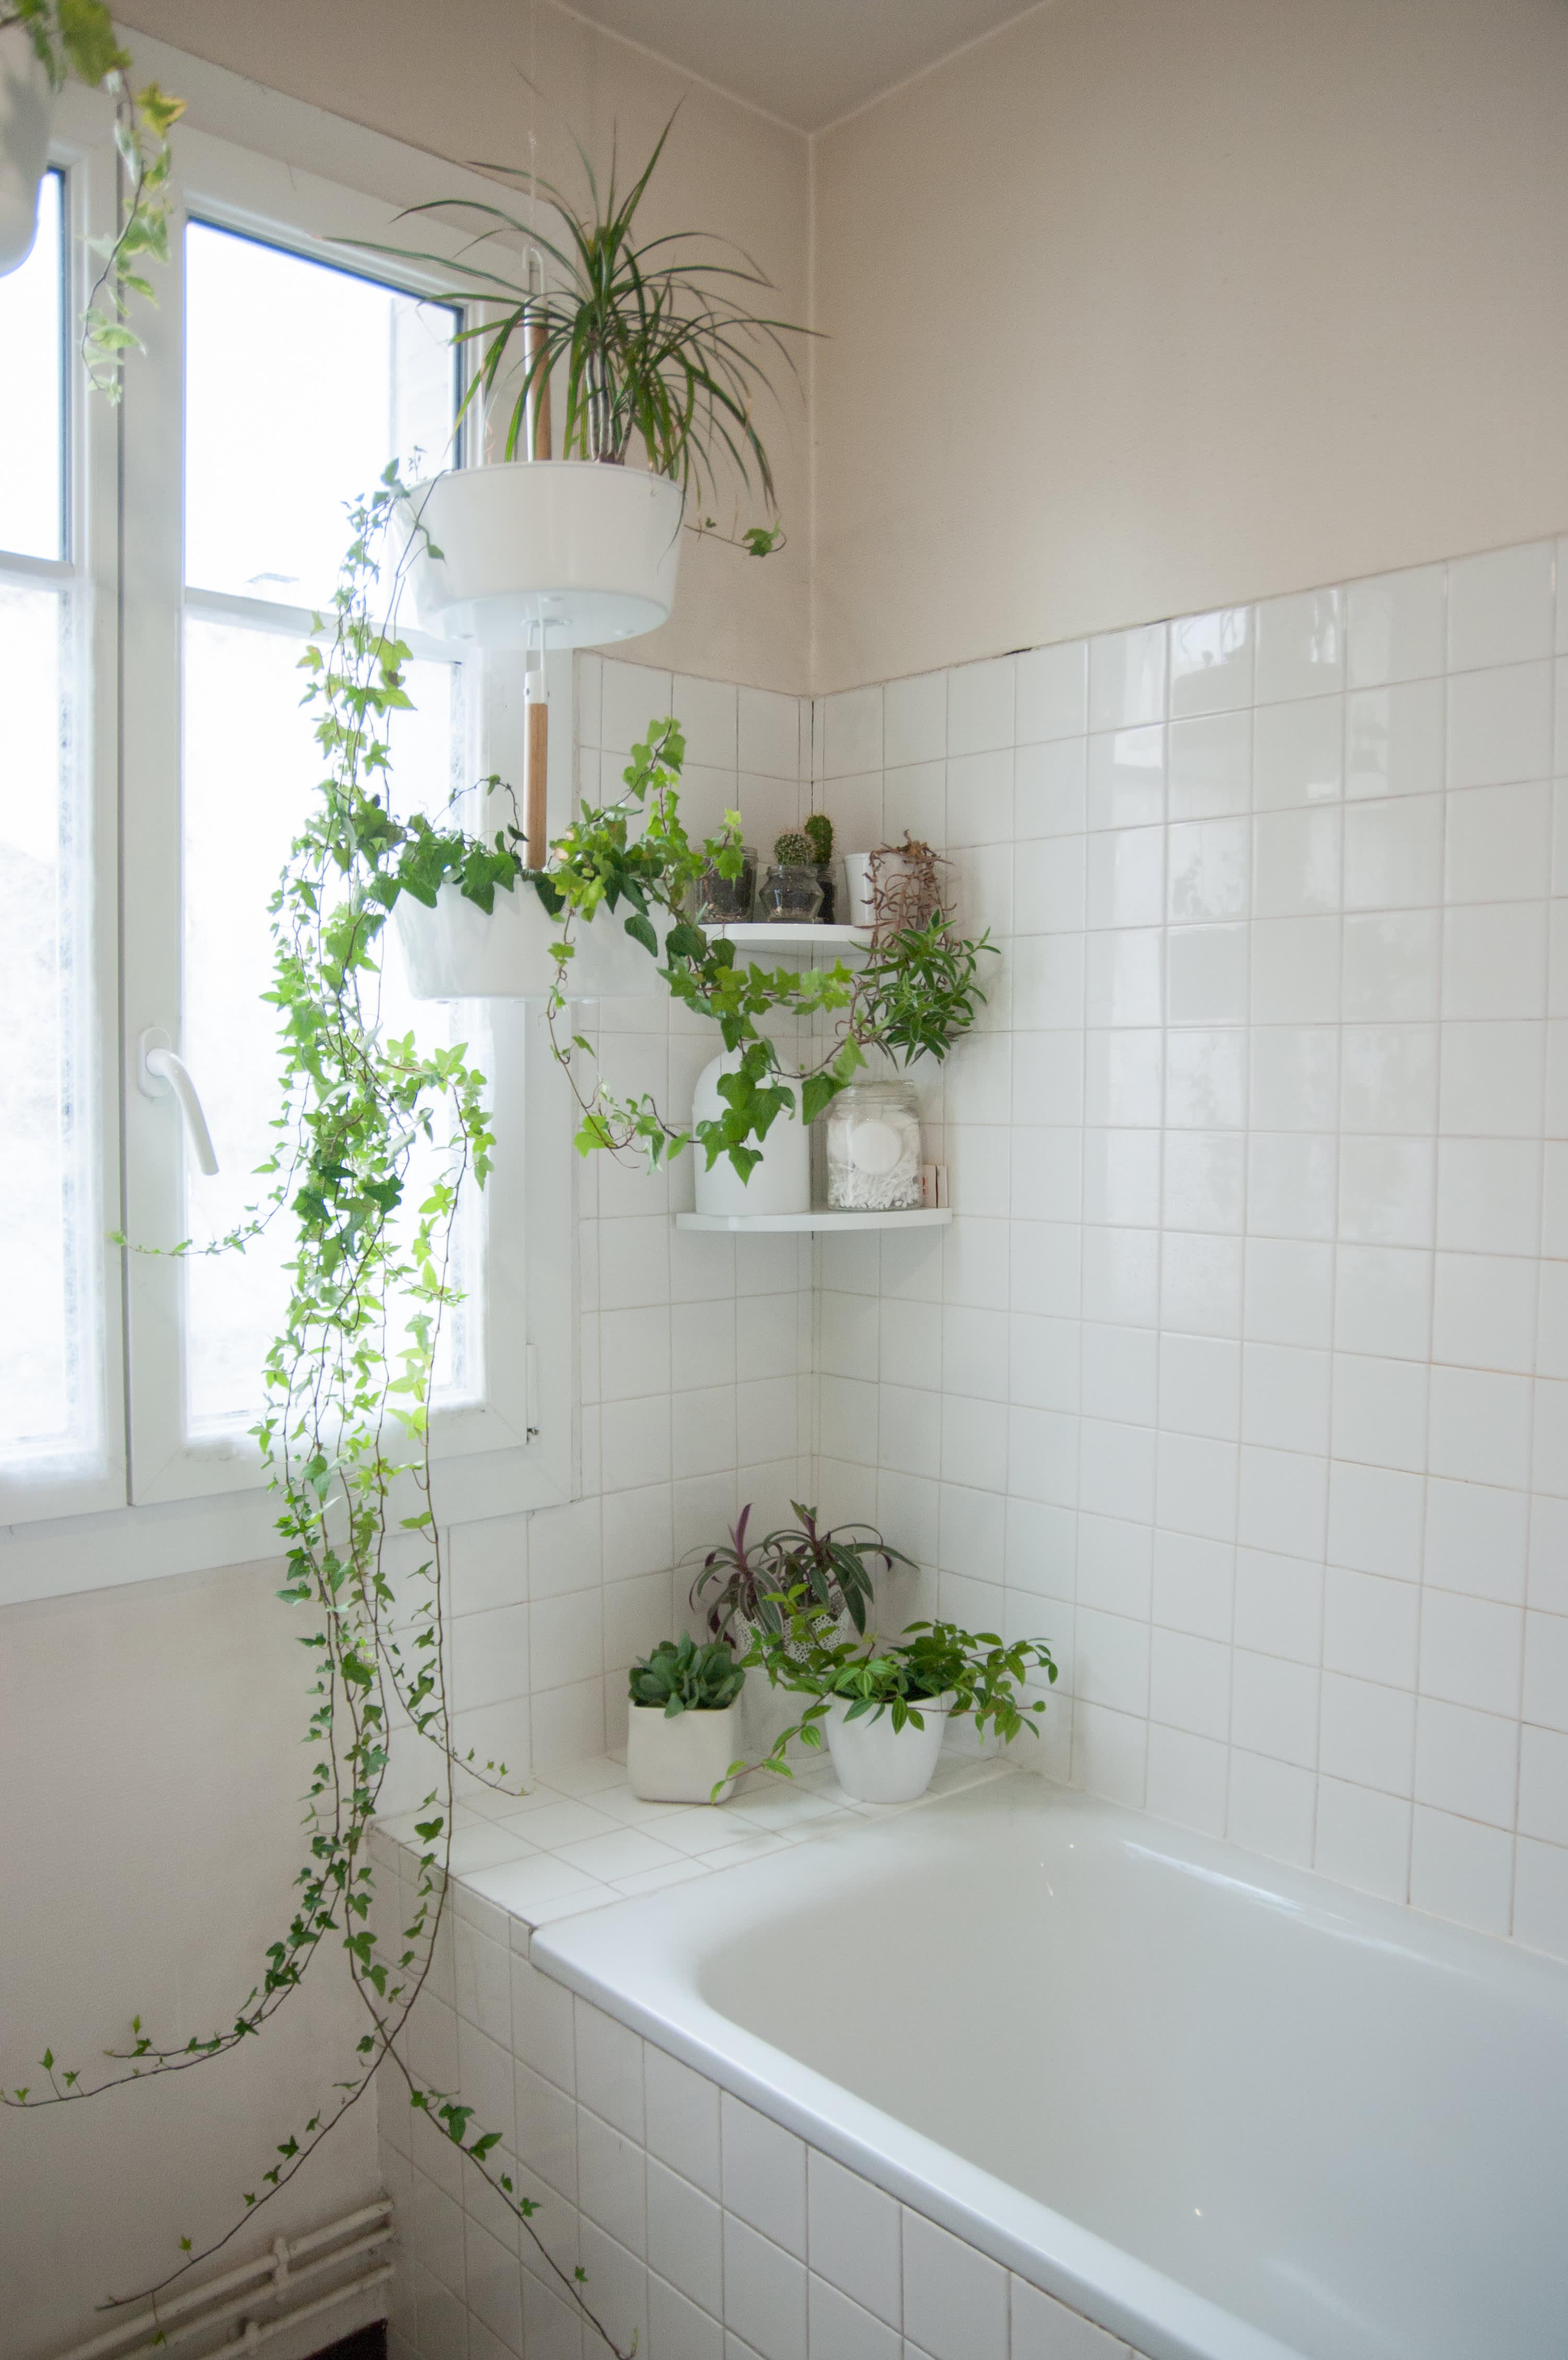 50 Best Bathroom Design Ideas | Apartment Therapy on Bathroom Ideas For Apartments  id=52376